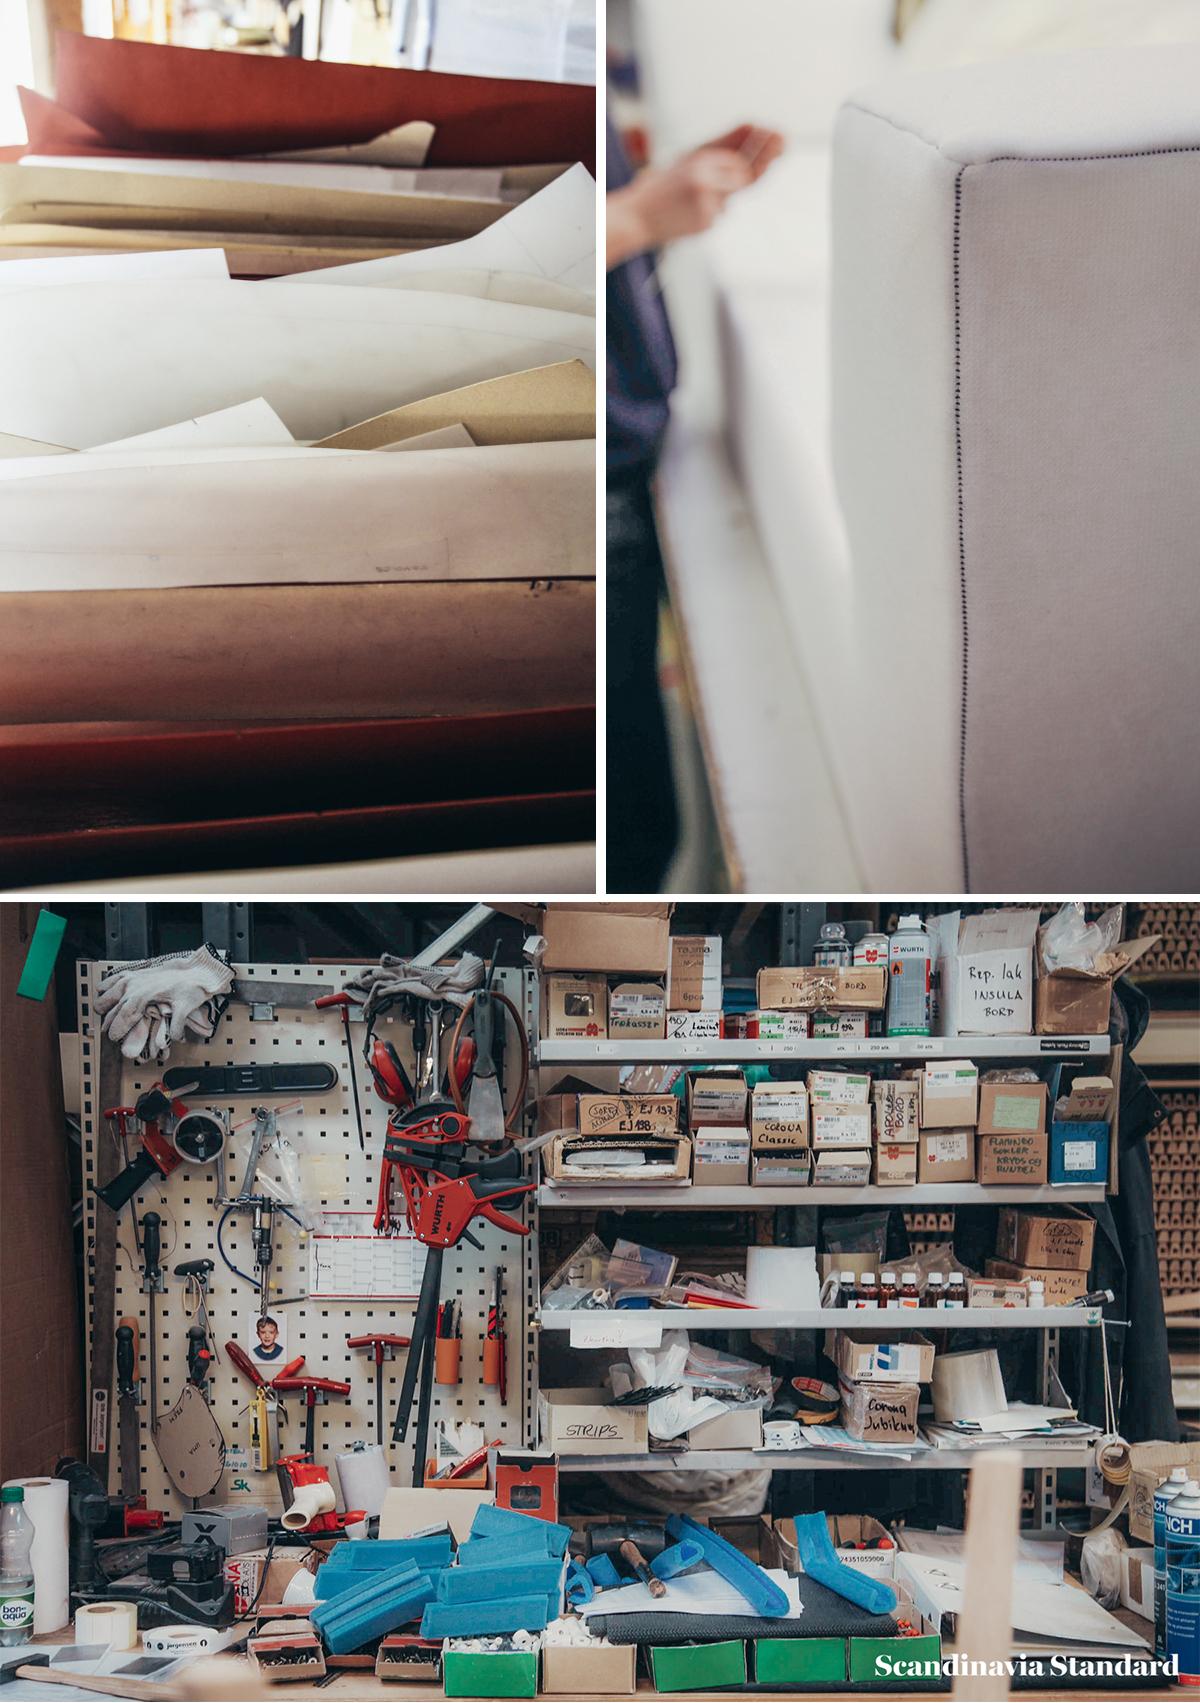 Danish Design Sofa Delphi Making of   Scandinavia Standard